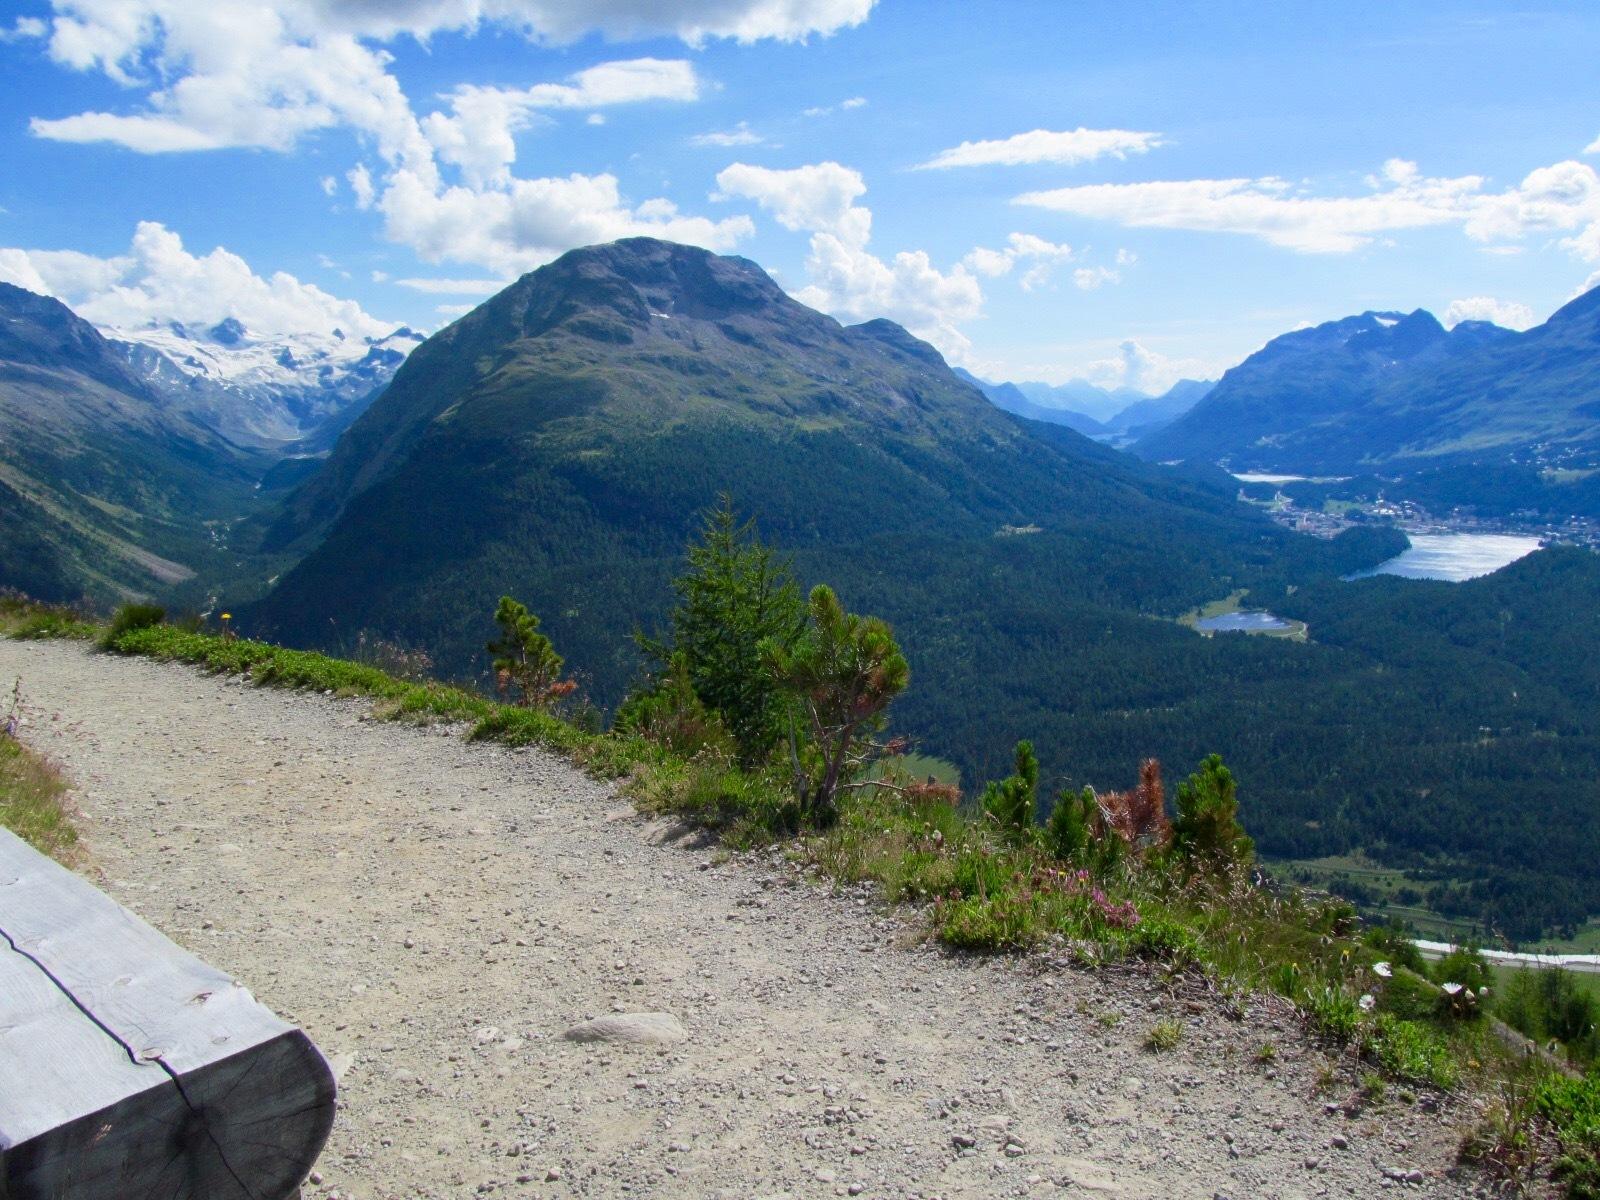 Sitzbänke Panoramaweg Muottas-Muragl - Alp Languard Slide 2